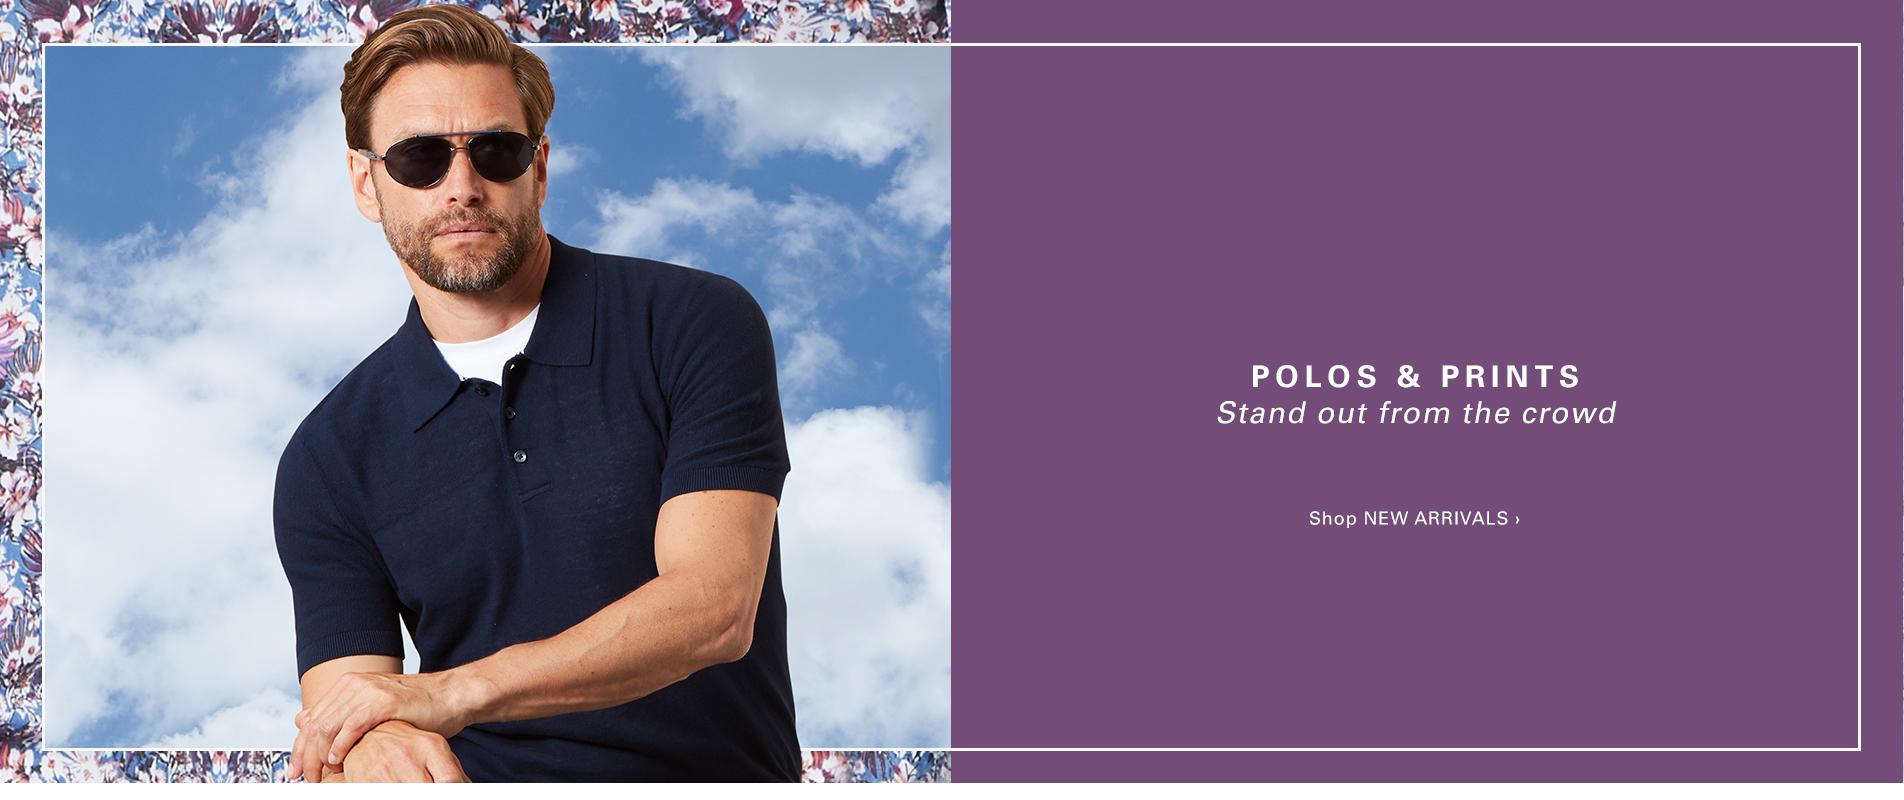 Prints + Polos